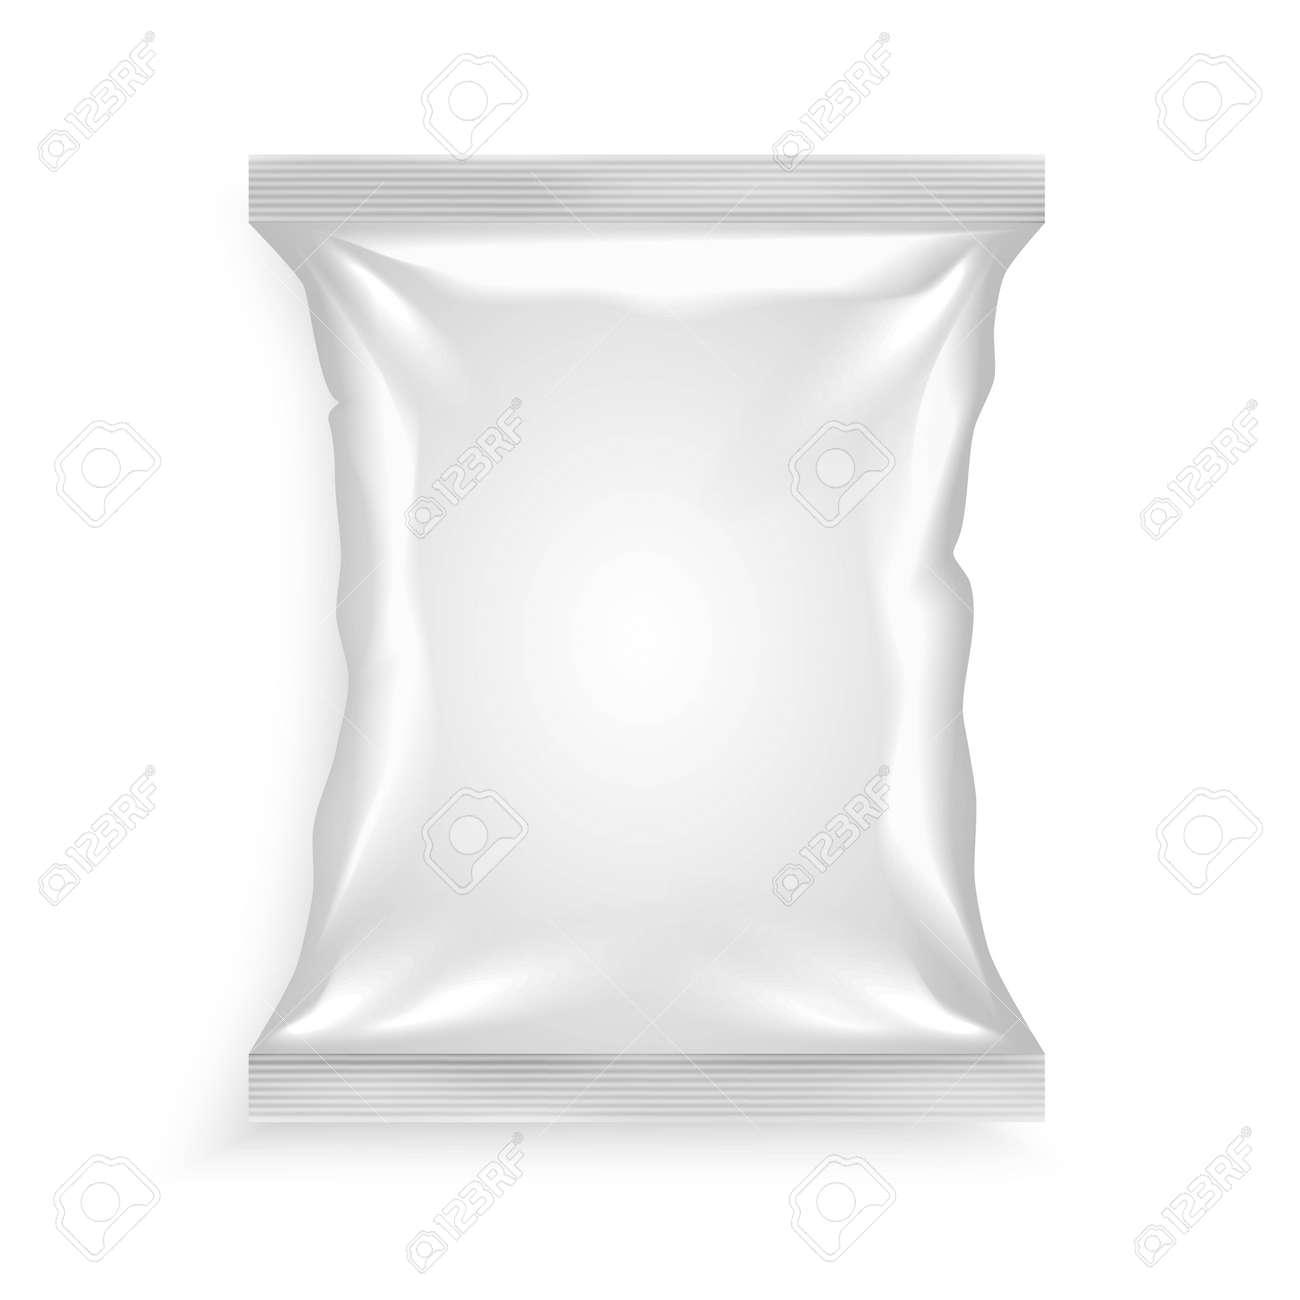 White plastic bag for chips snacks crisps peanuts another food for designers vector illustration - 166537412